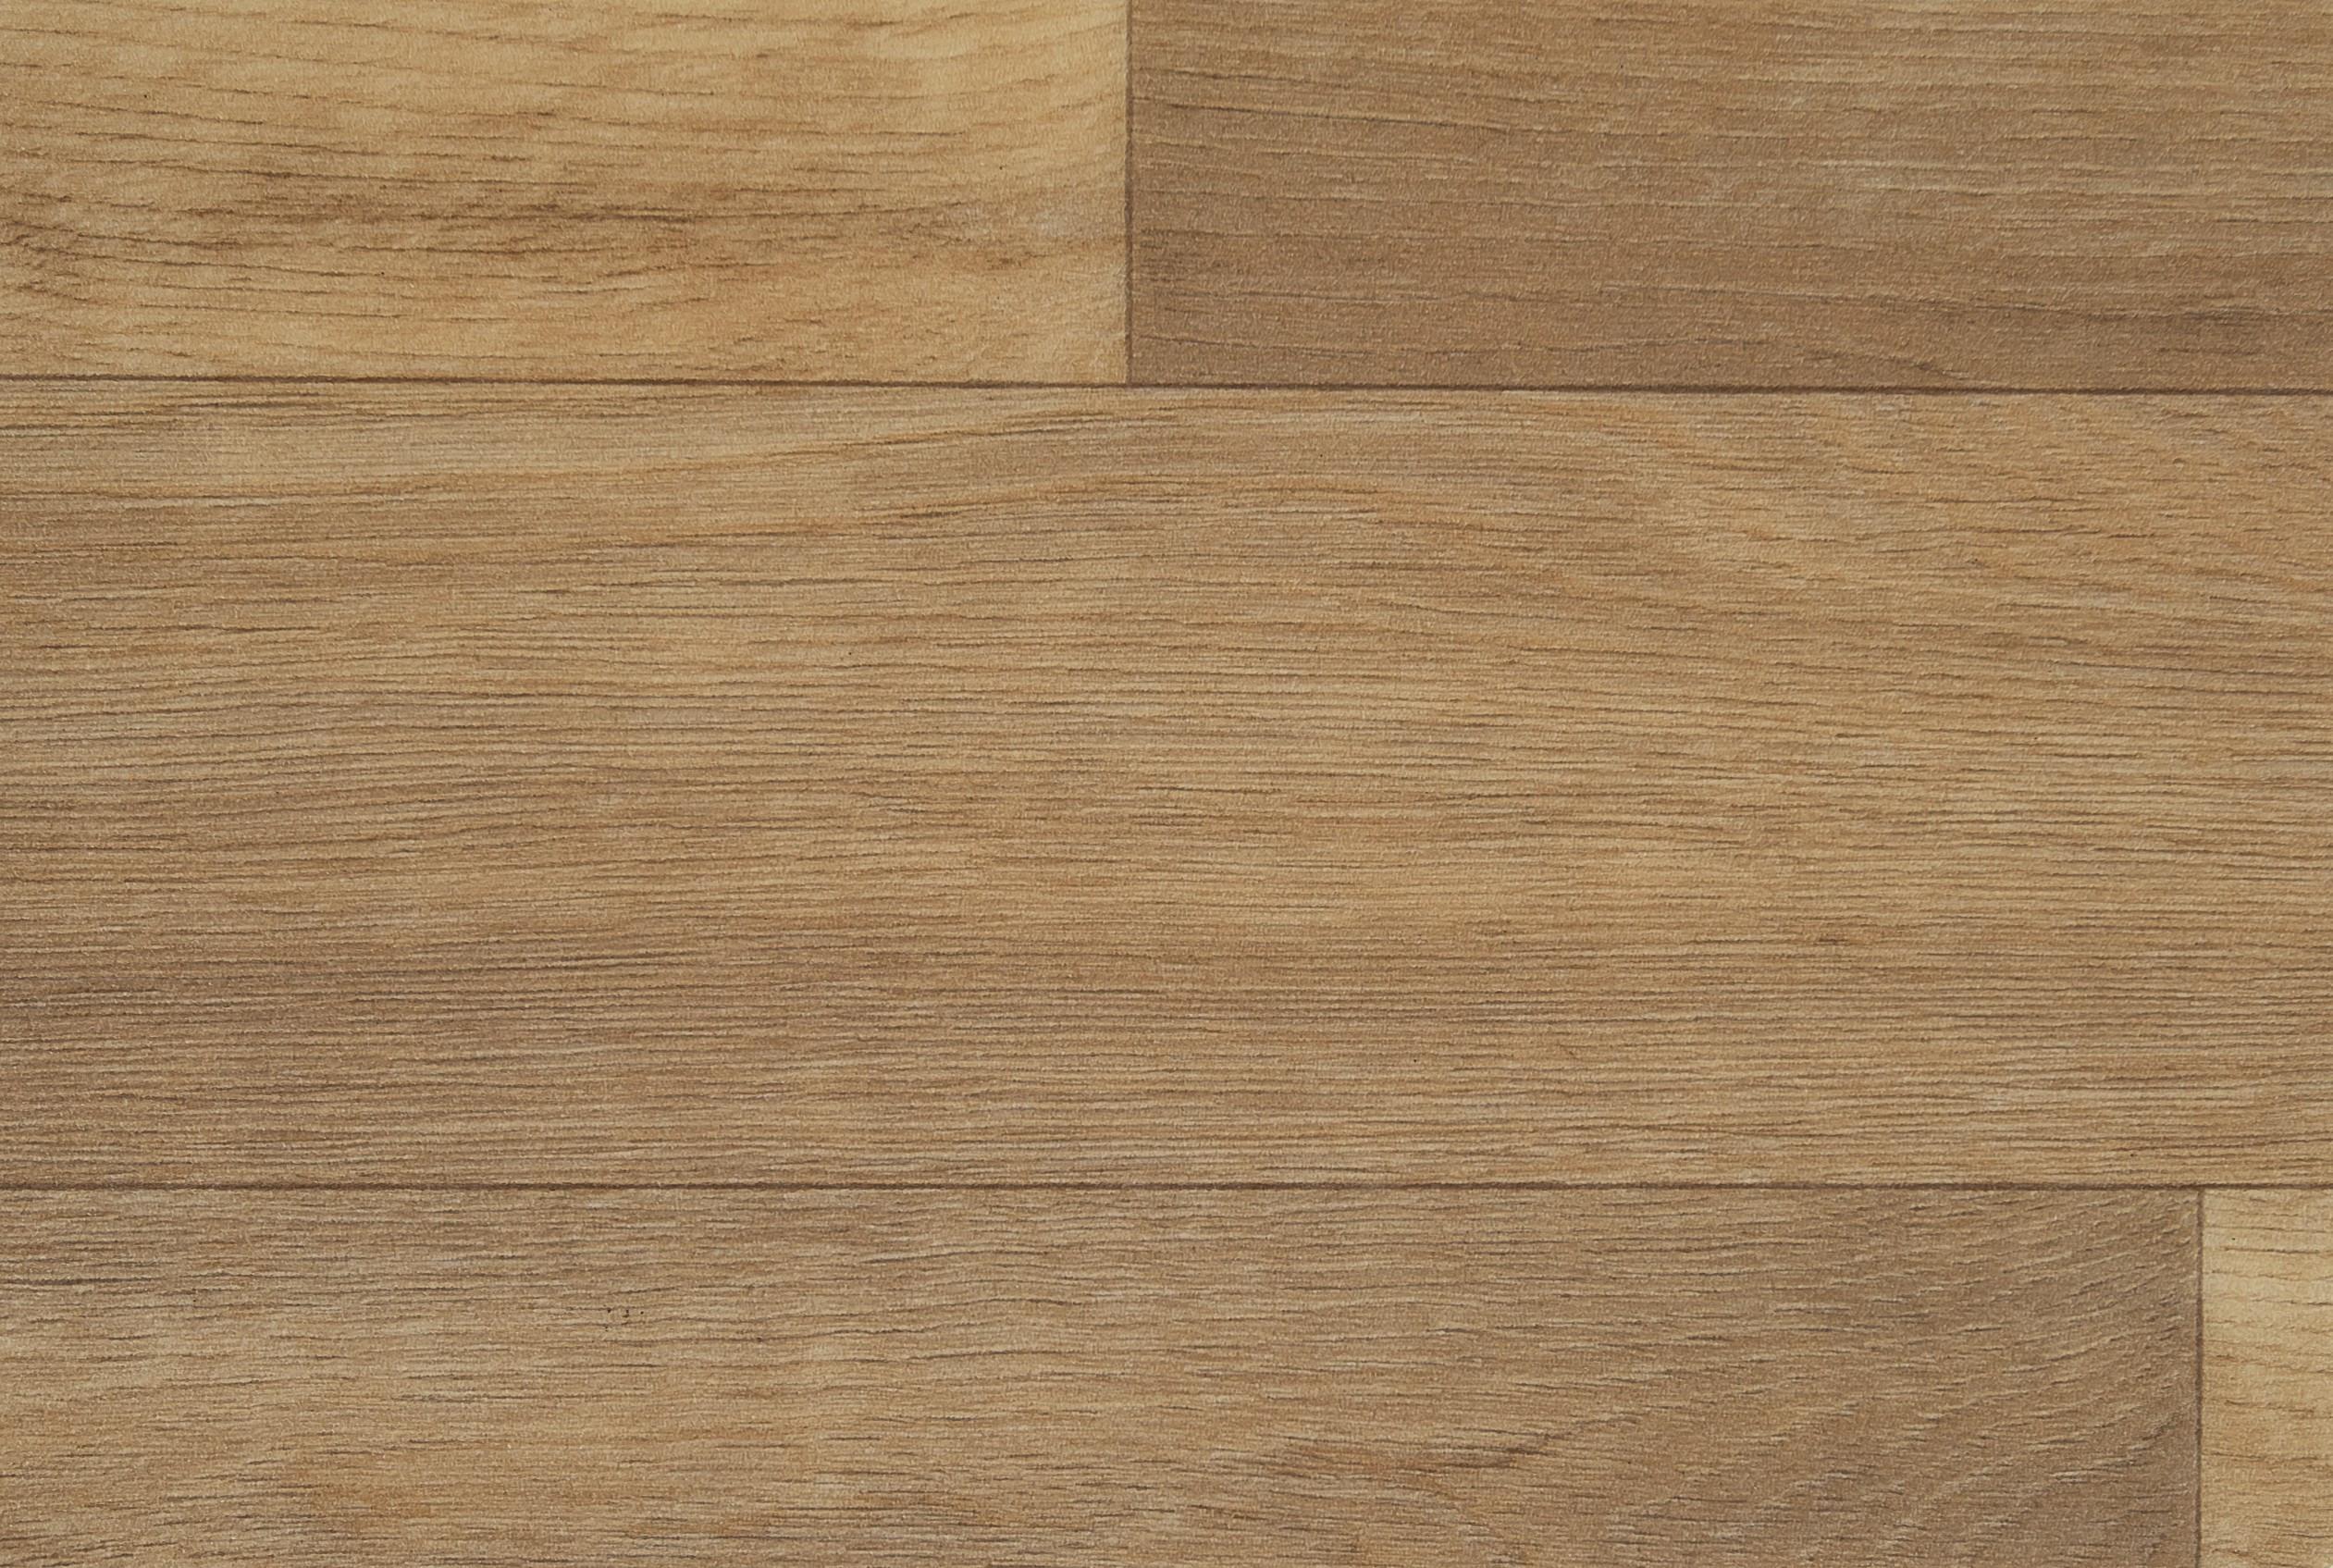 PVC podlaha Xtreme Natural Oak 226M - Rozměr na míru cm